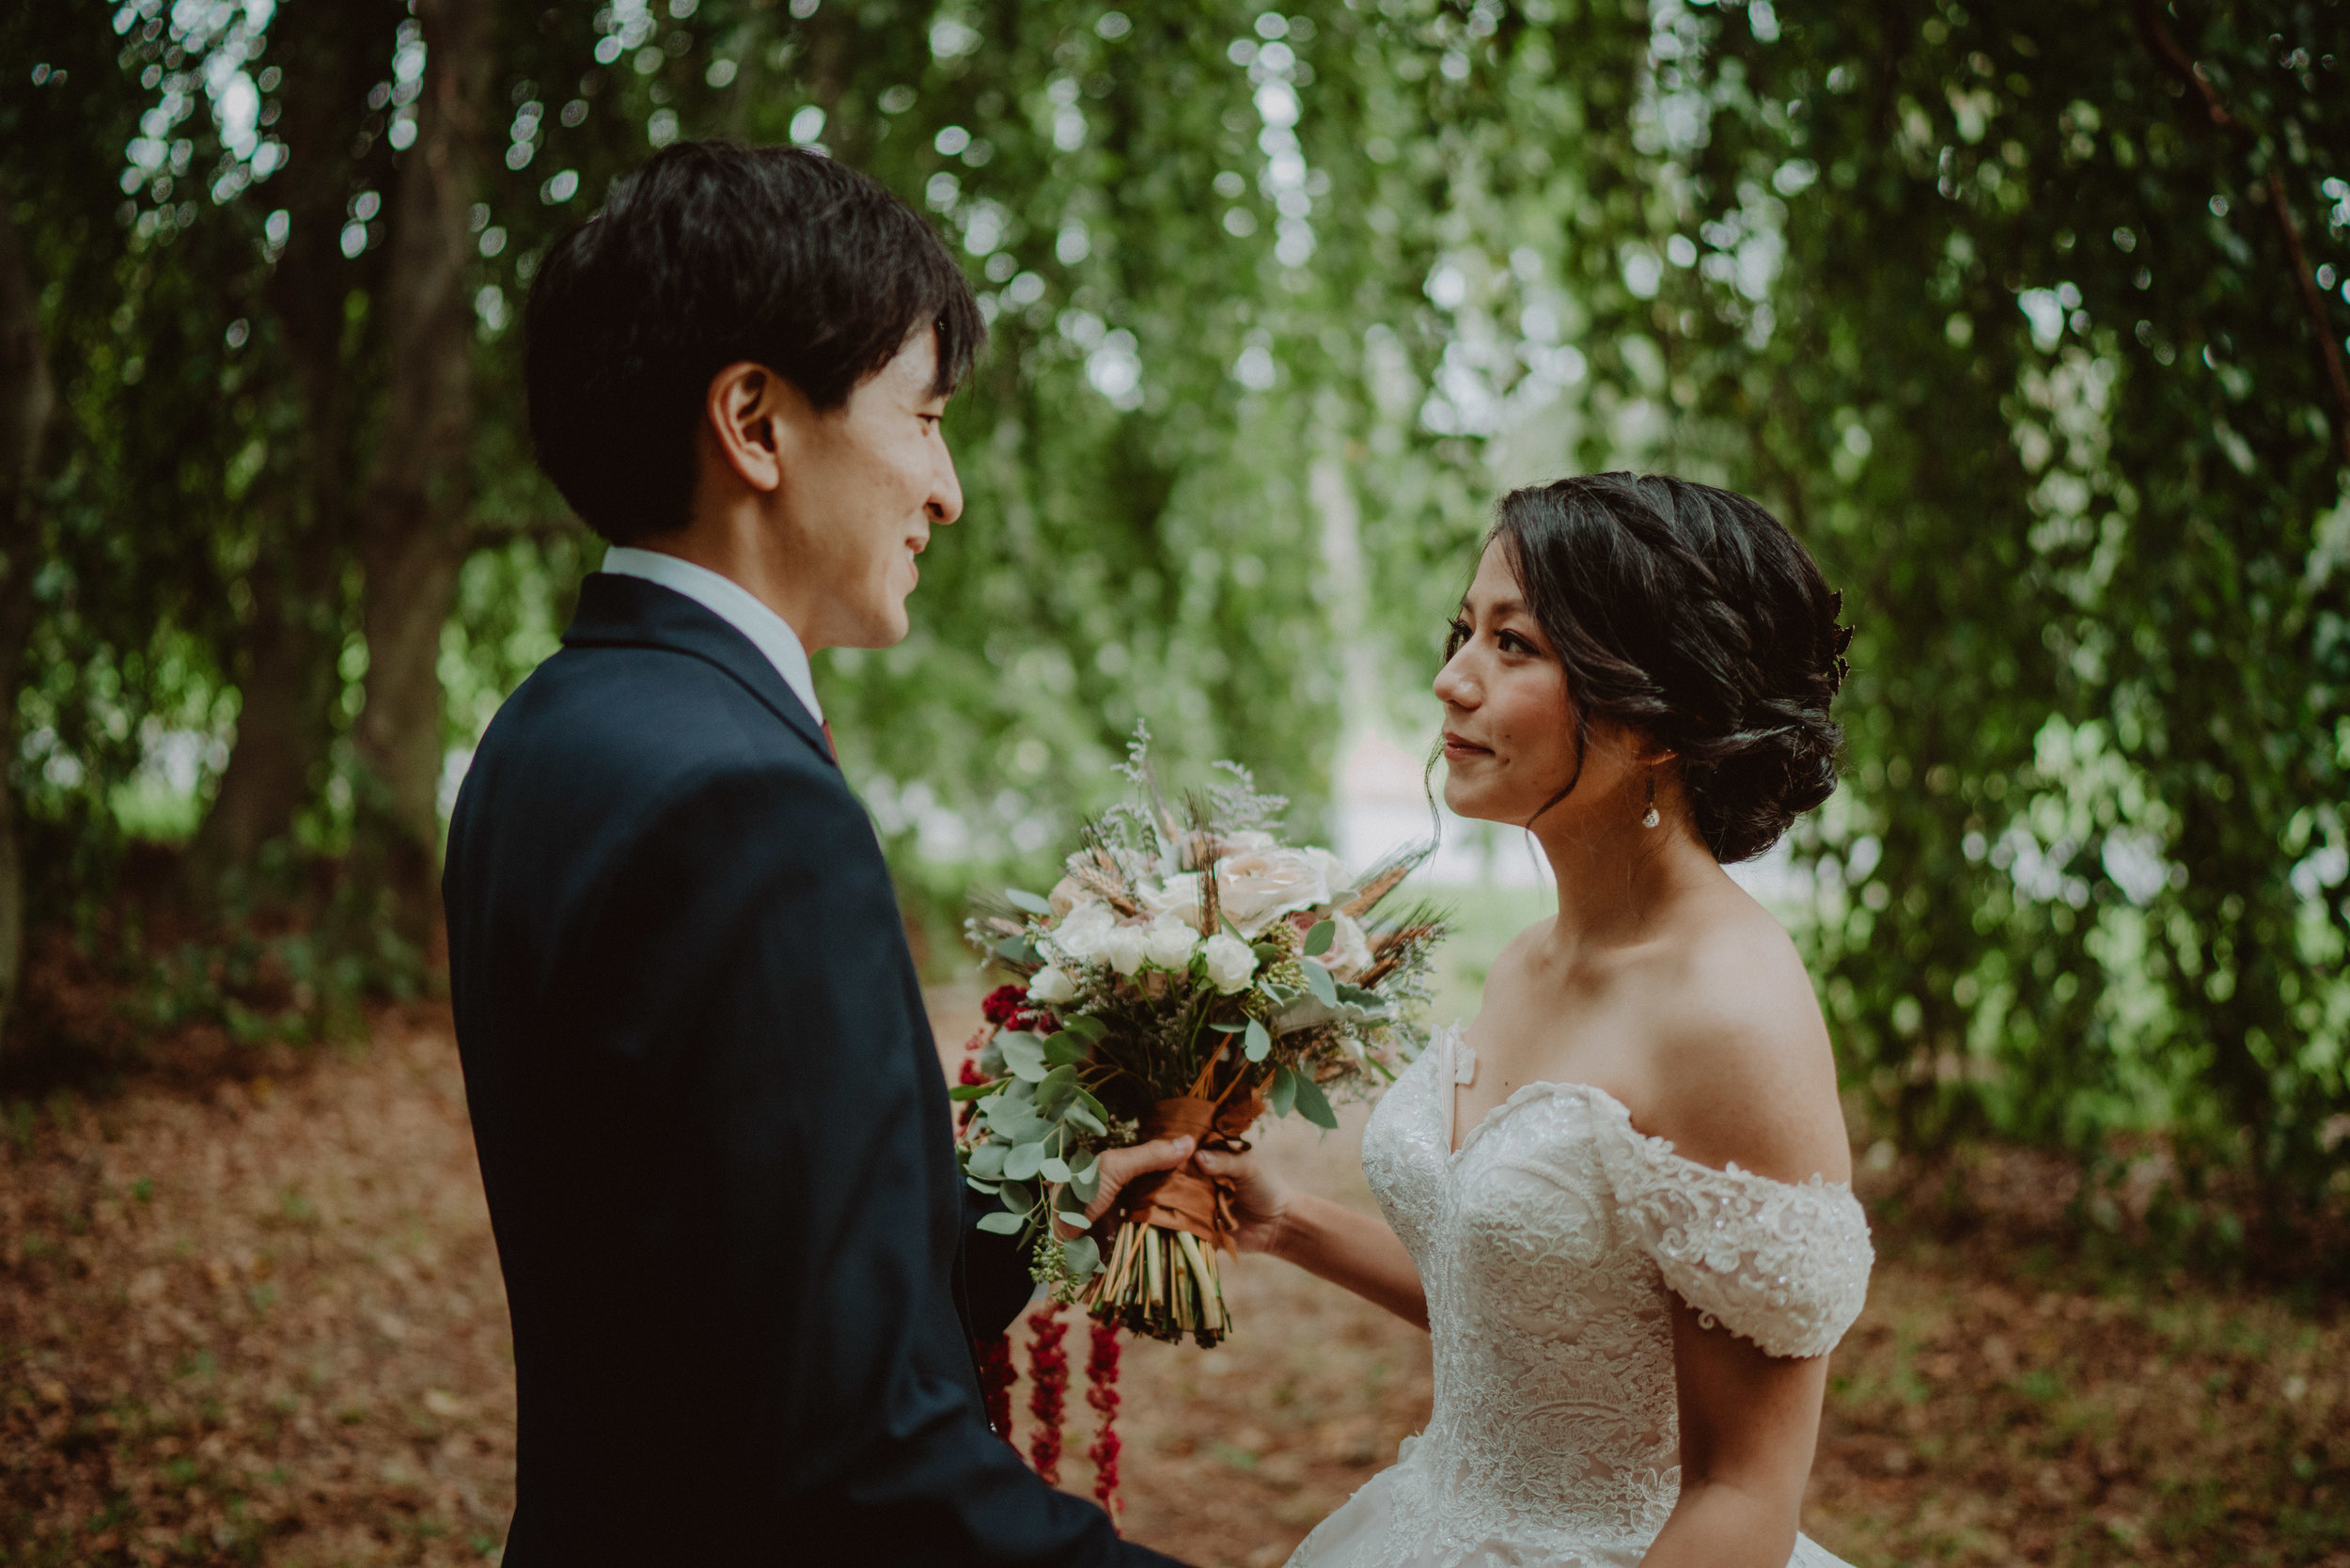 Irene-and-Jae-2019_Brooklyn_Wedding_Photographer_Chellise_Michael_Photography--37.jpg